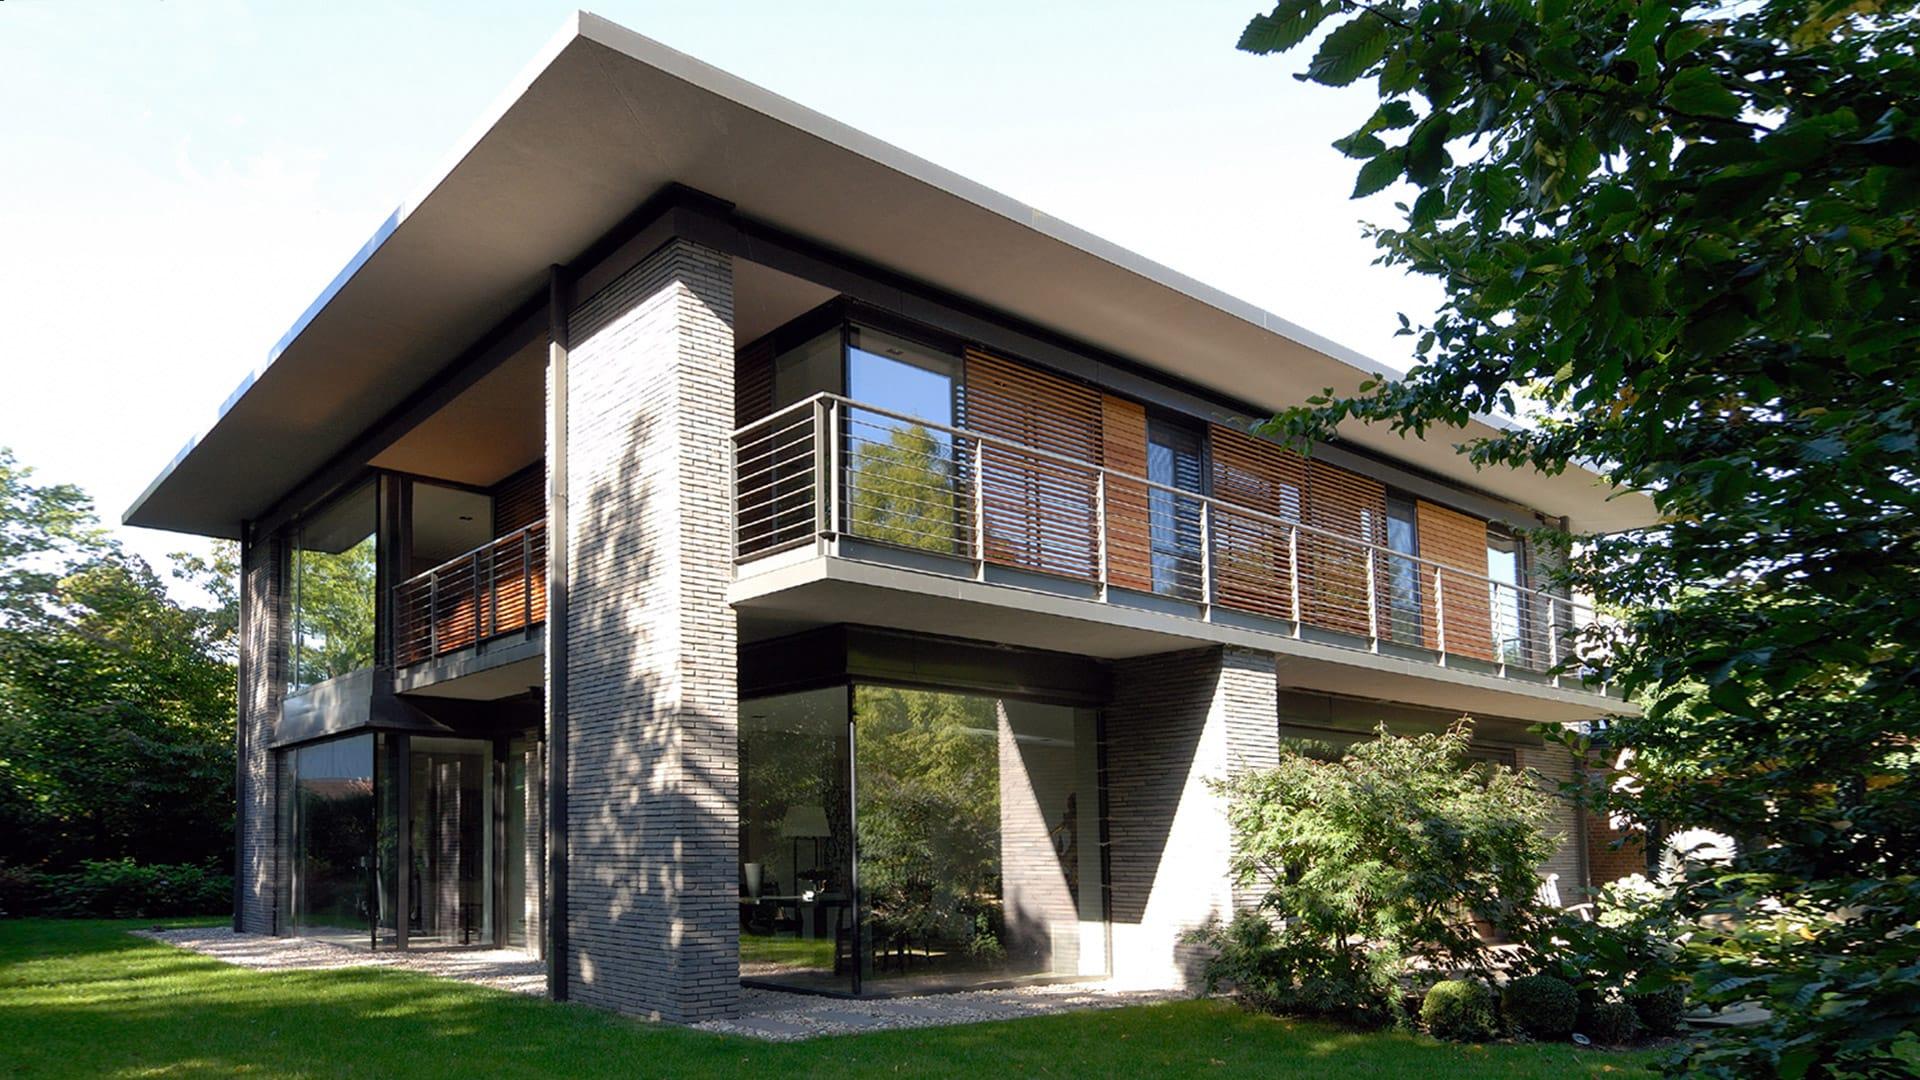 braunholz architekten villa oedeme. Black Bedroom Furniture Sets. Home Design Ideas